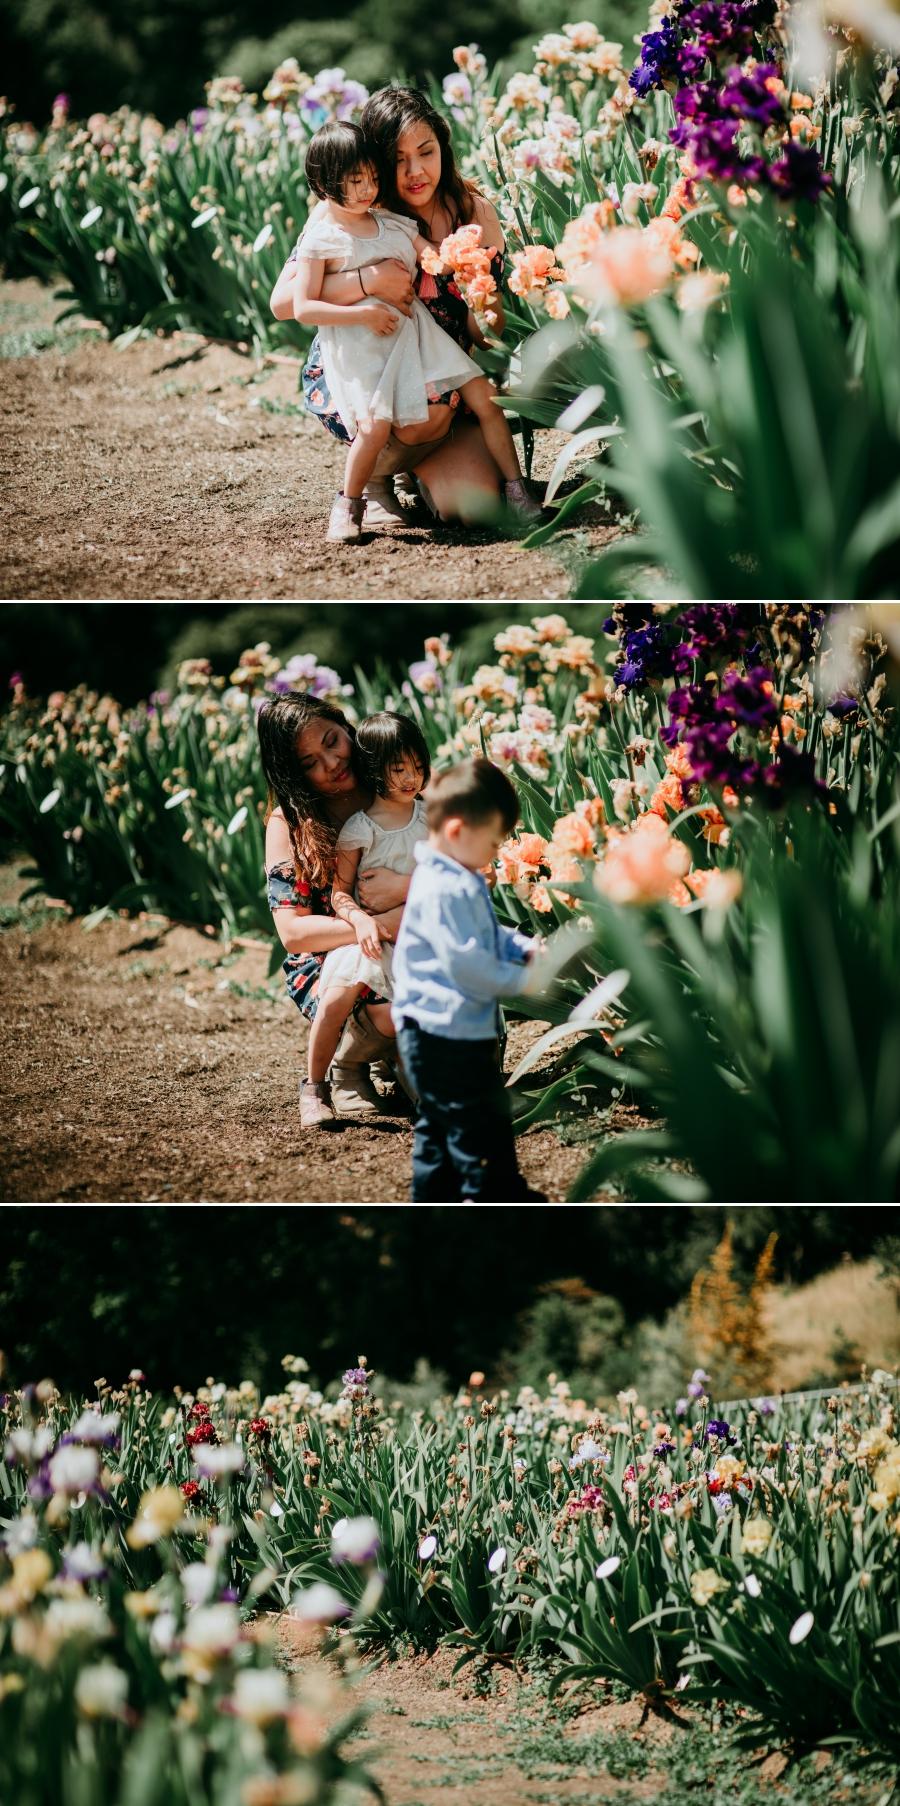 Mothersday2019 5.jpg